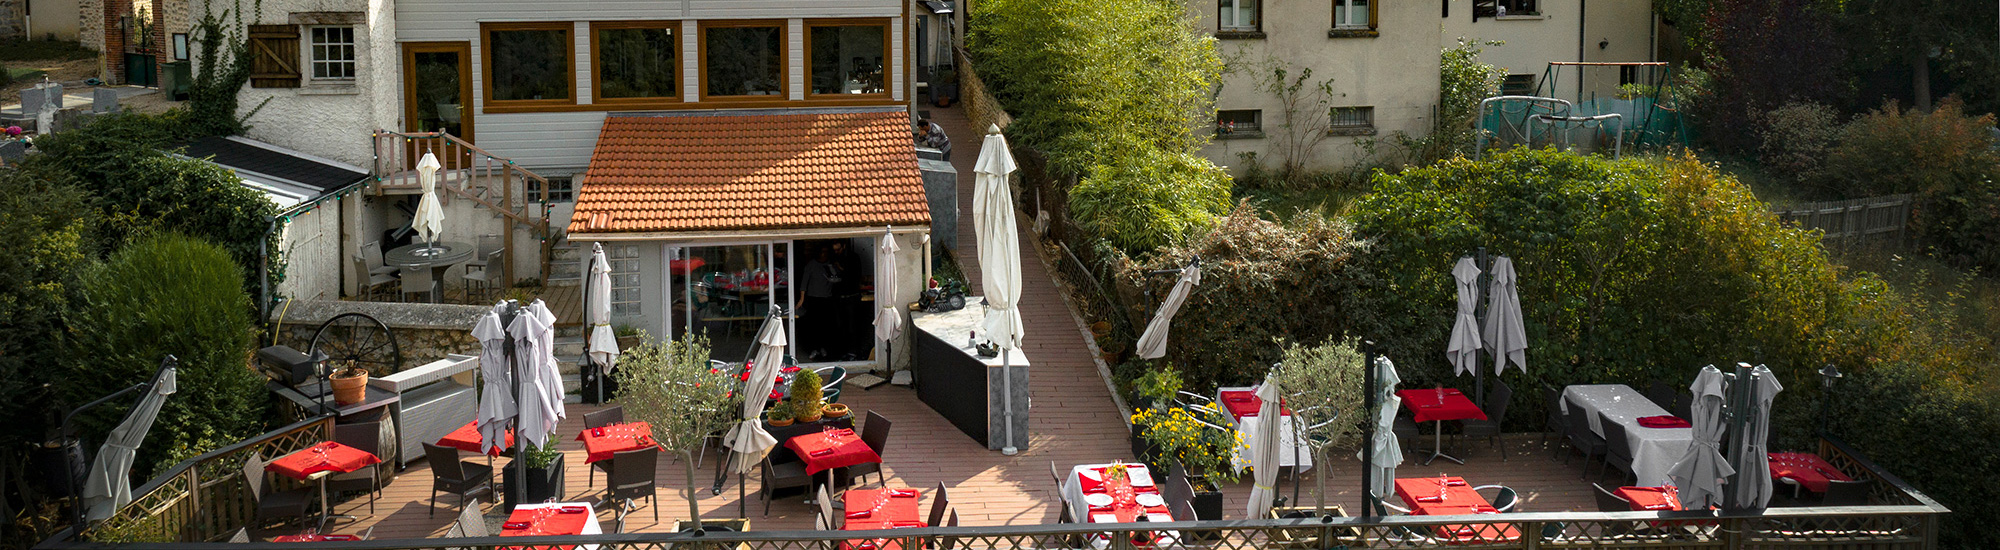 Terrasse - Auberge de la Garenne